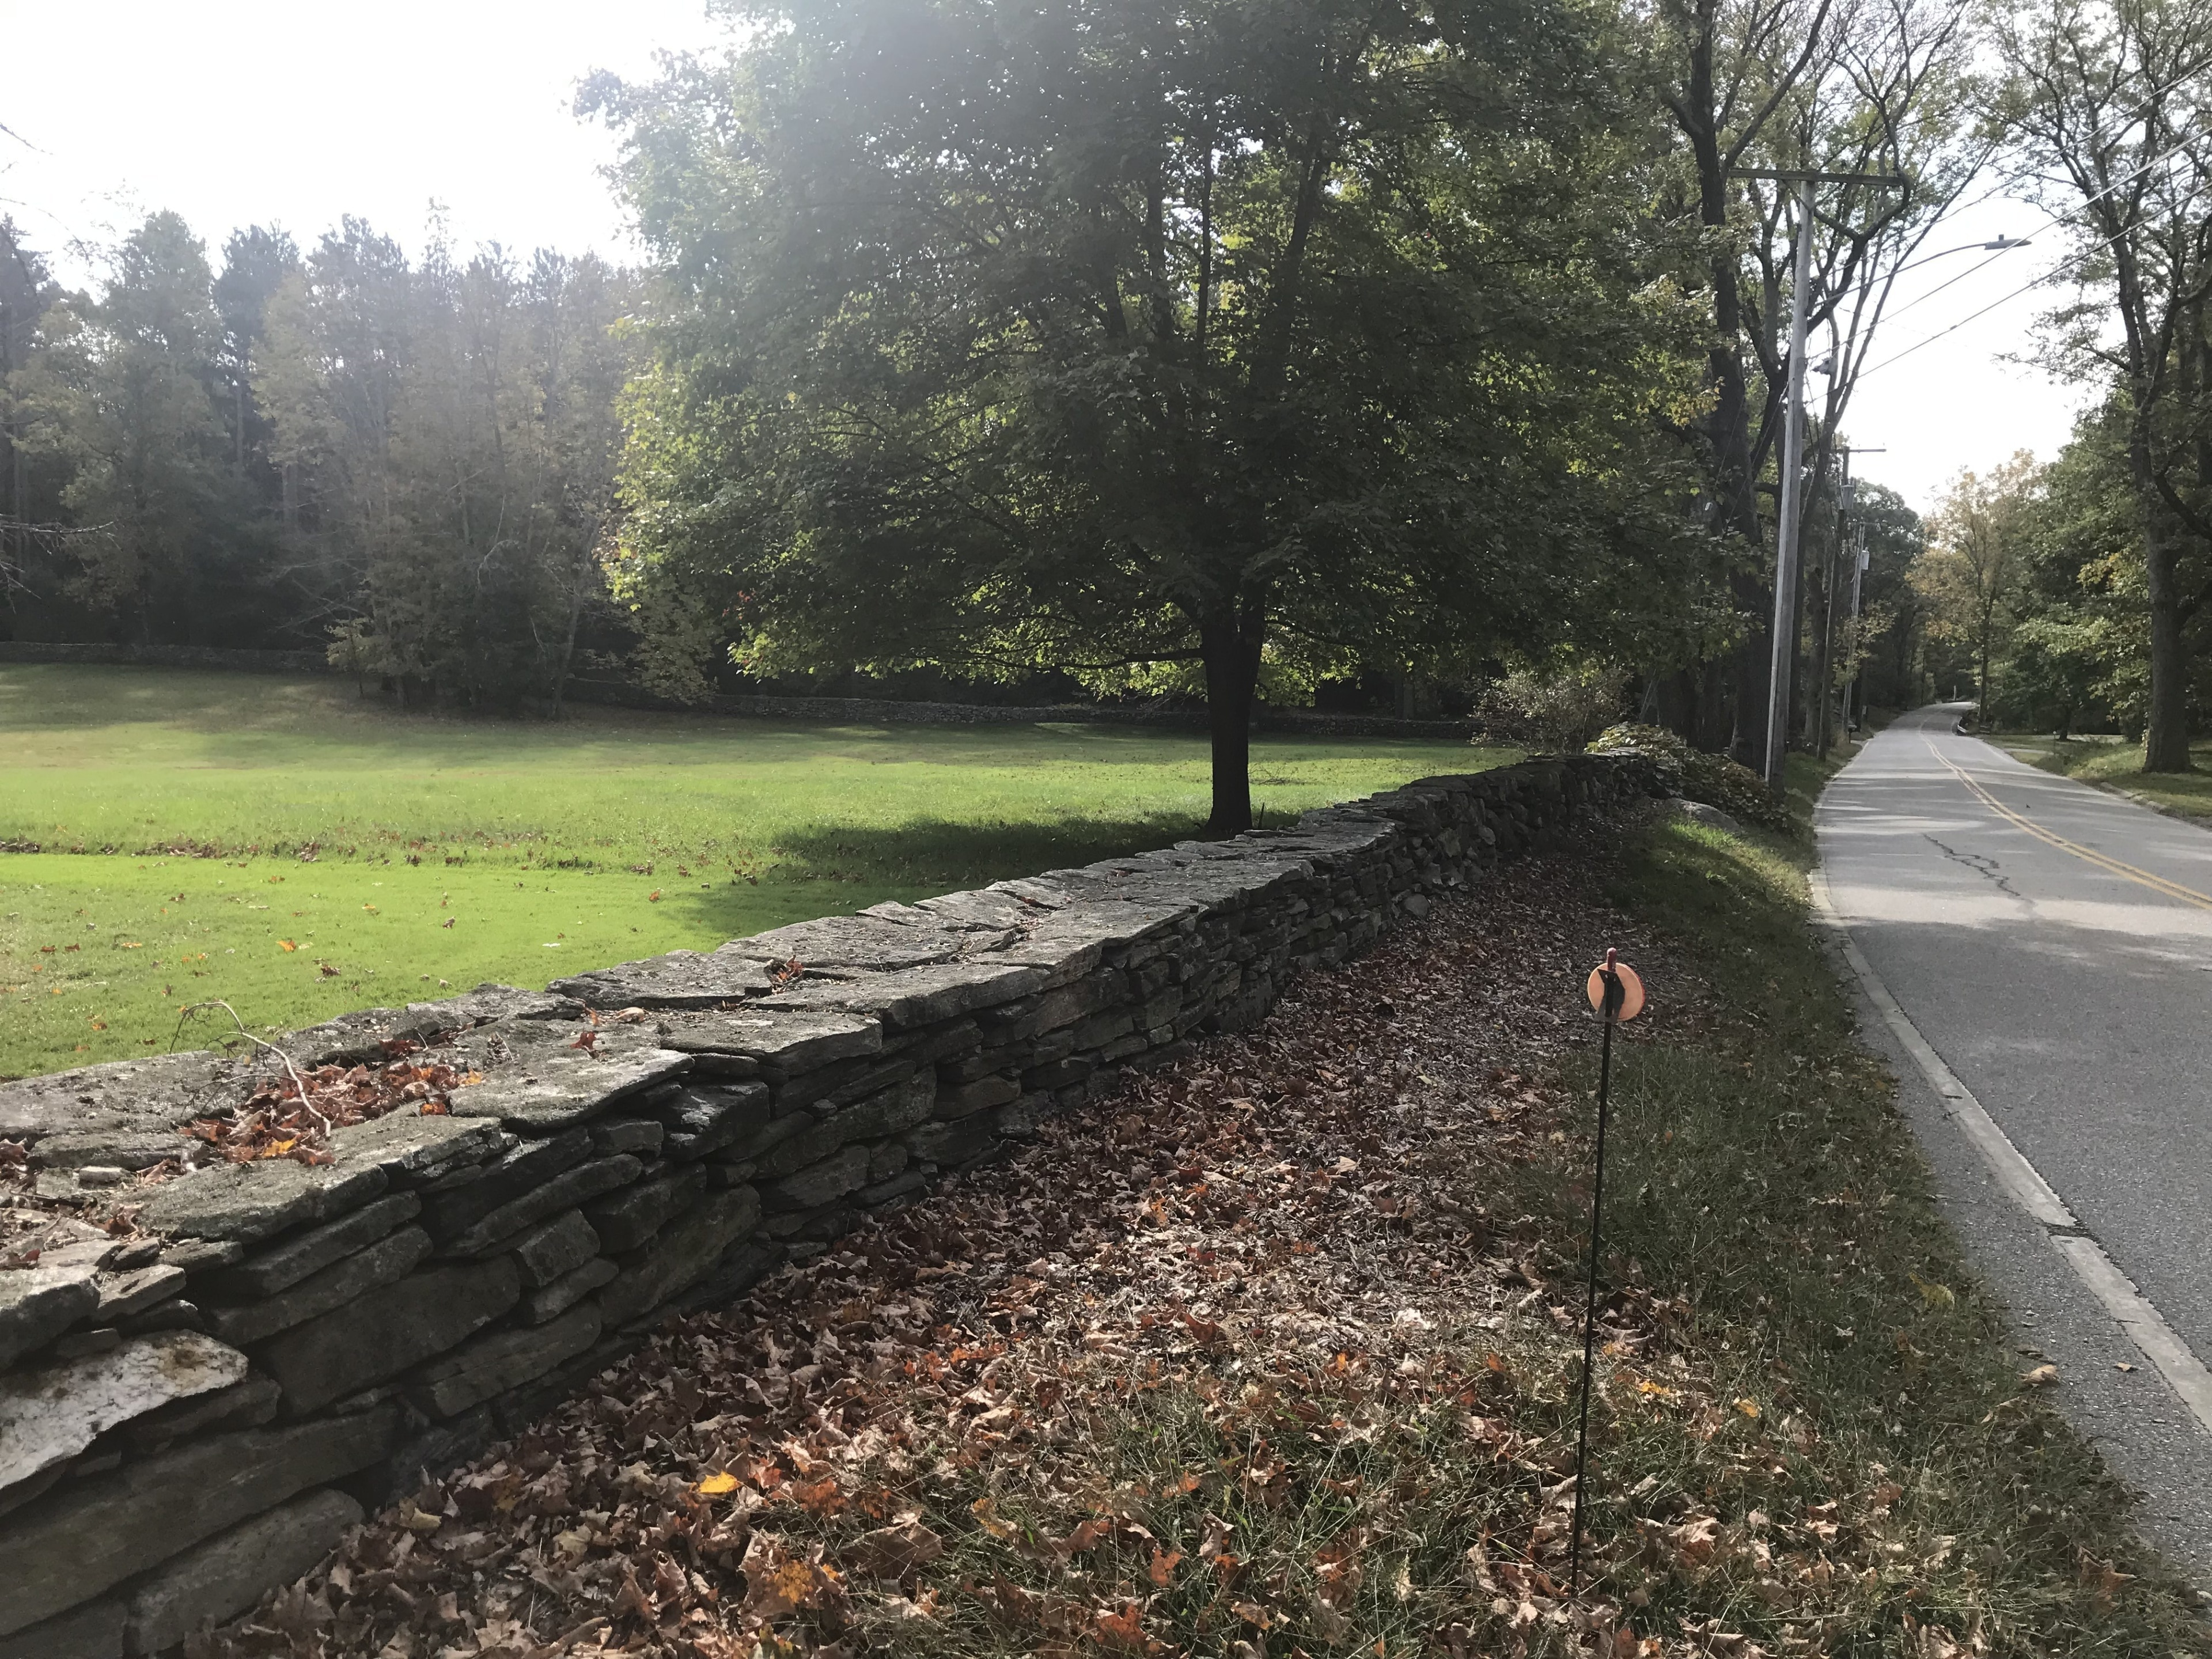 Thompson, Connecticut, USA